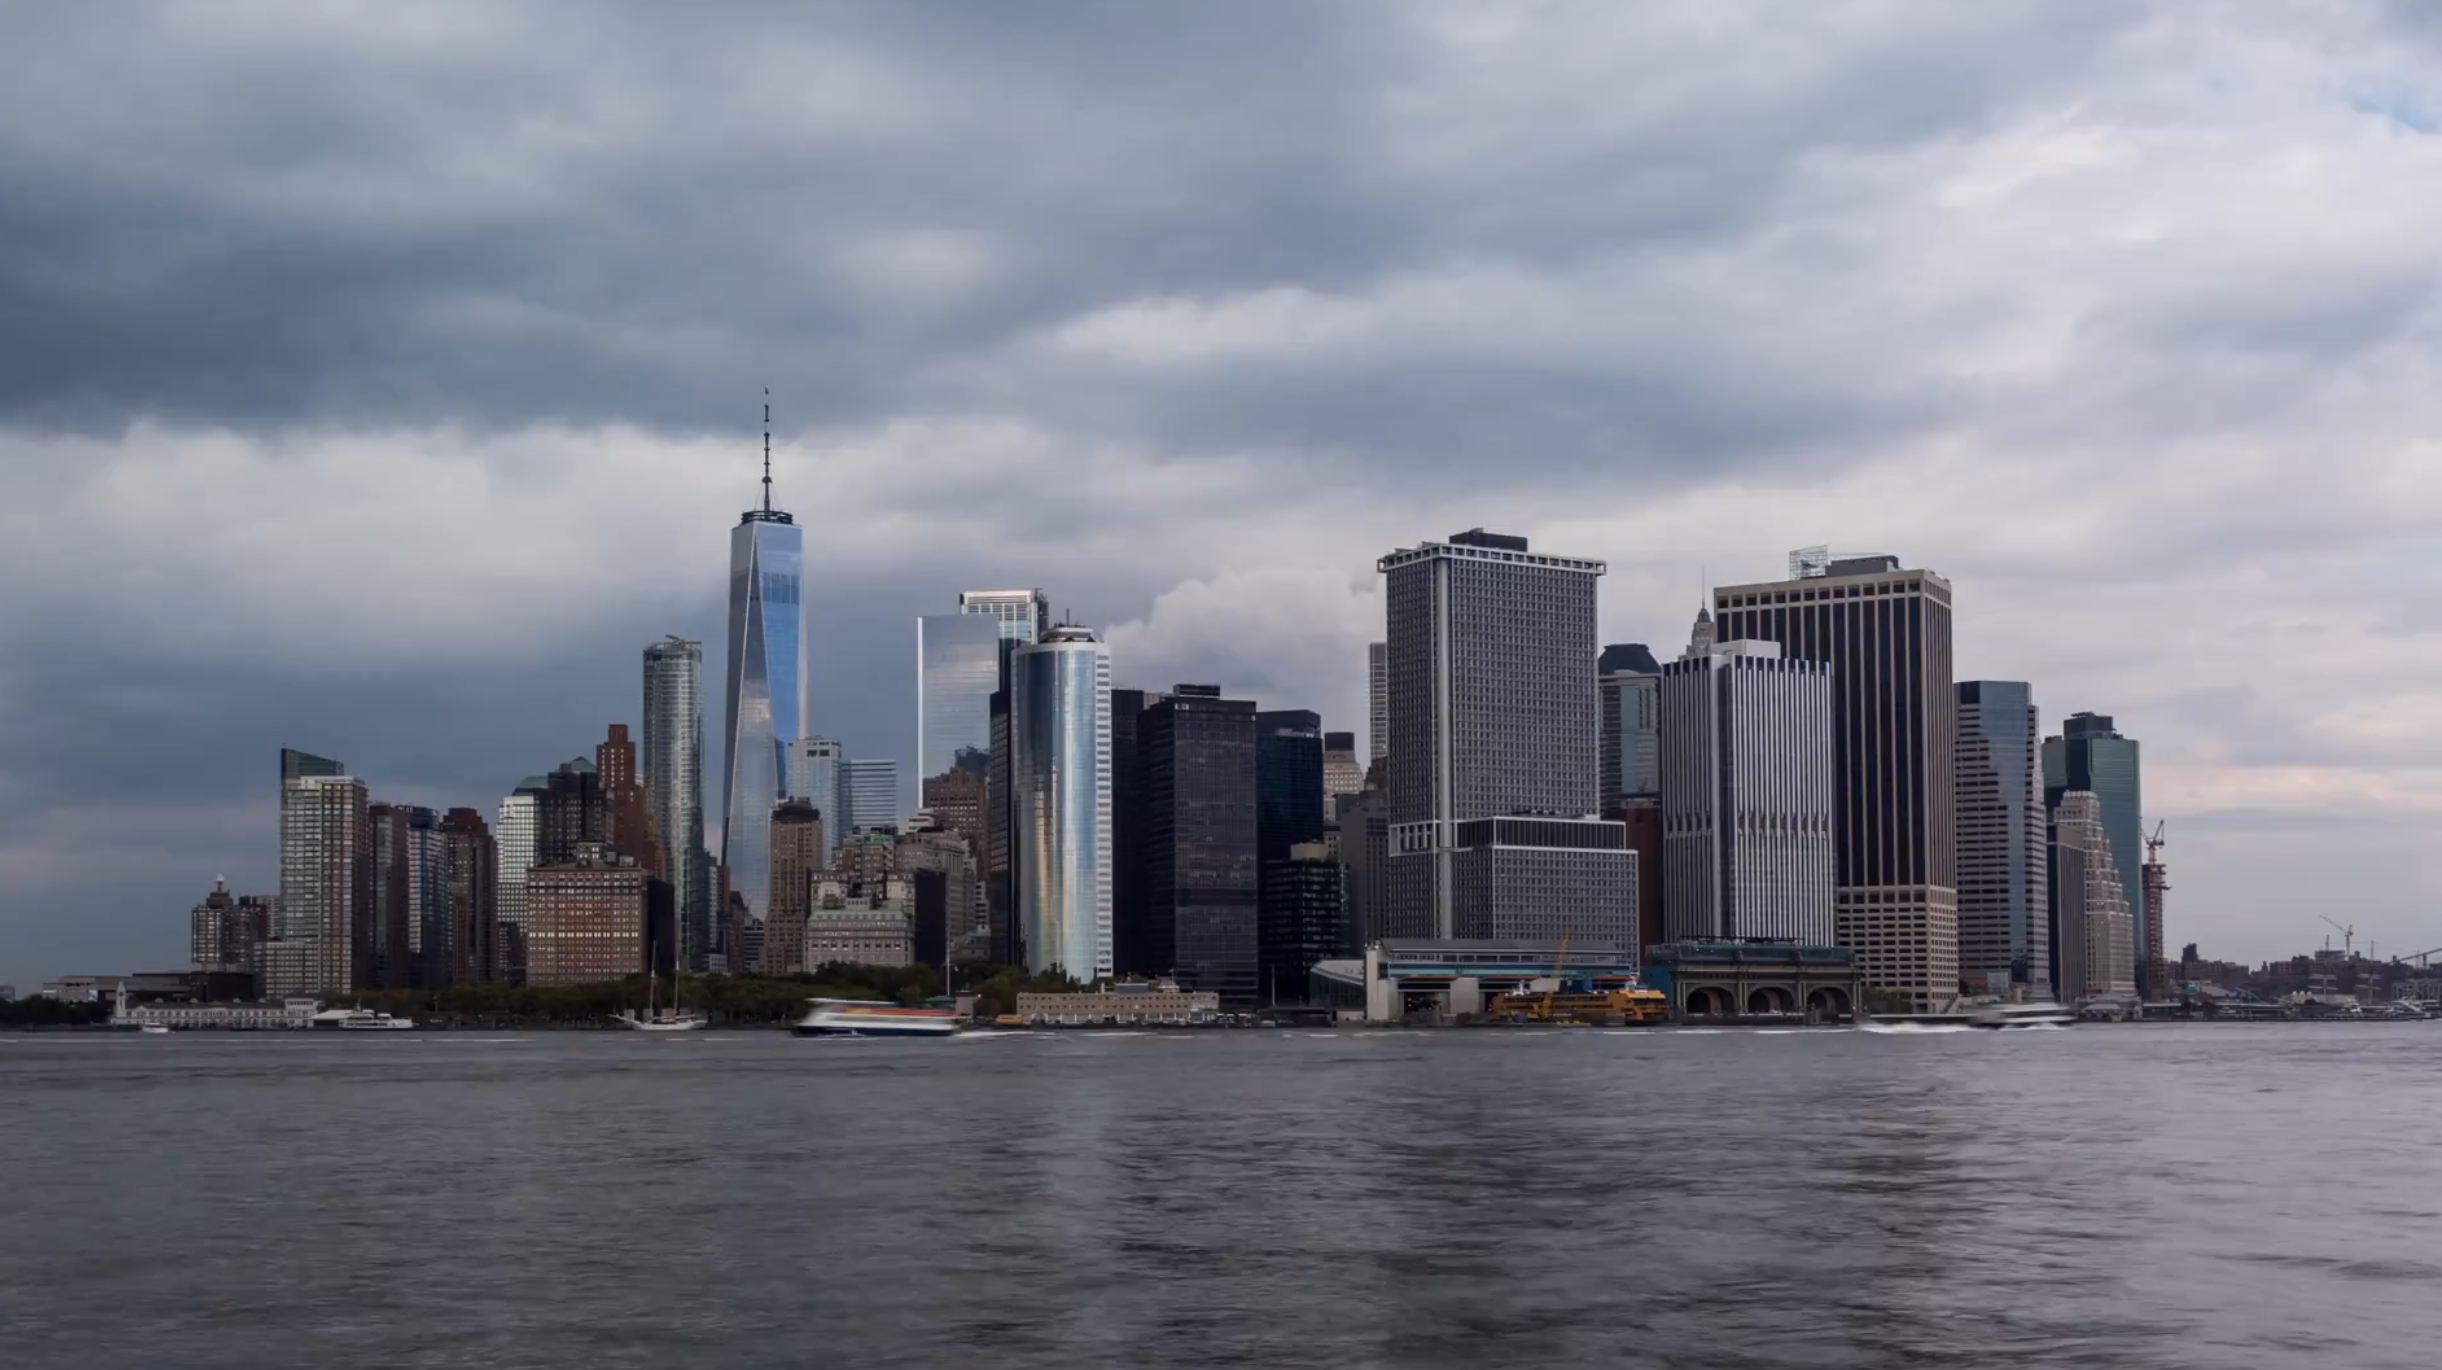 Hd Manhattan Skyline New York City Day Hyperlapse Emeric S Timelapse